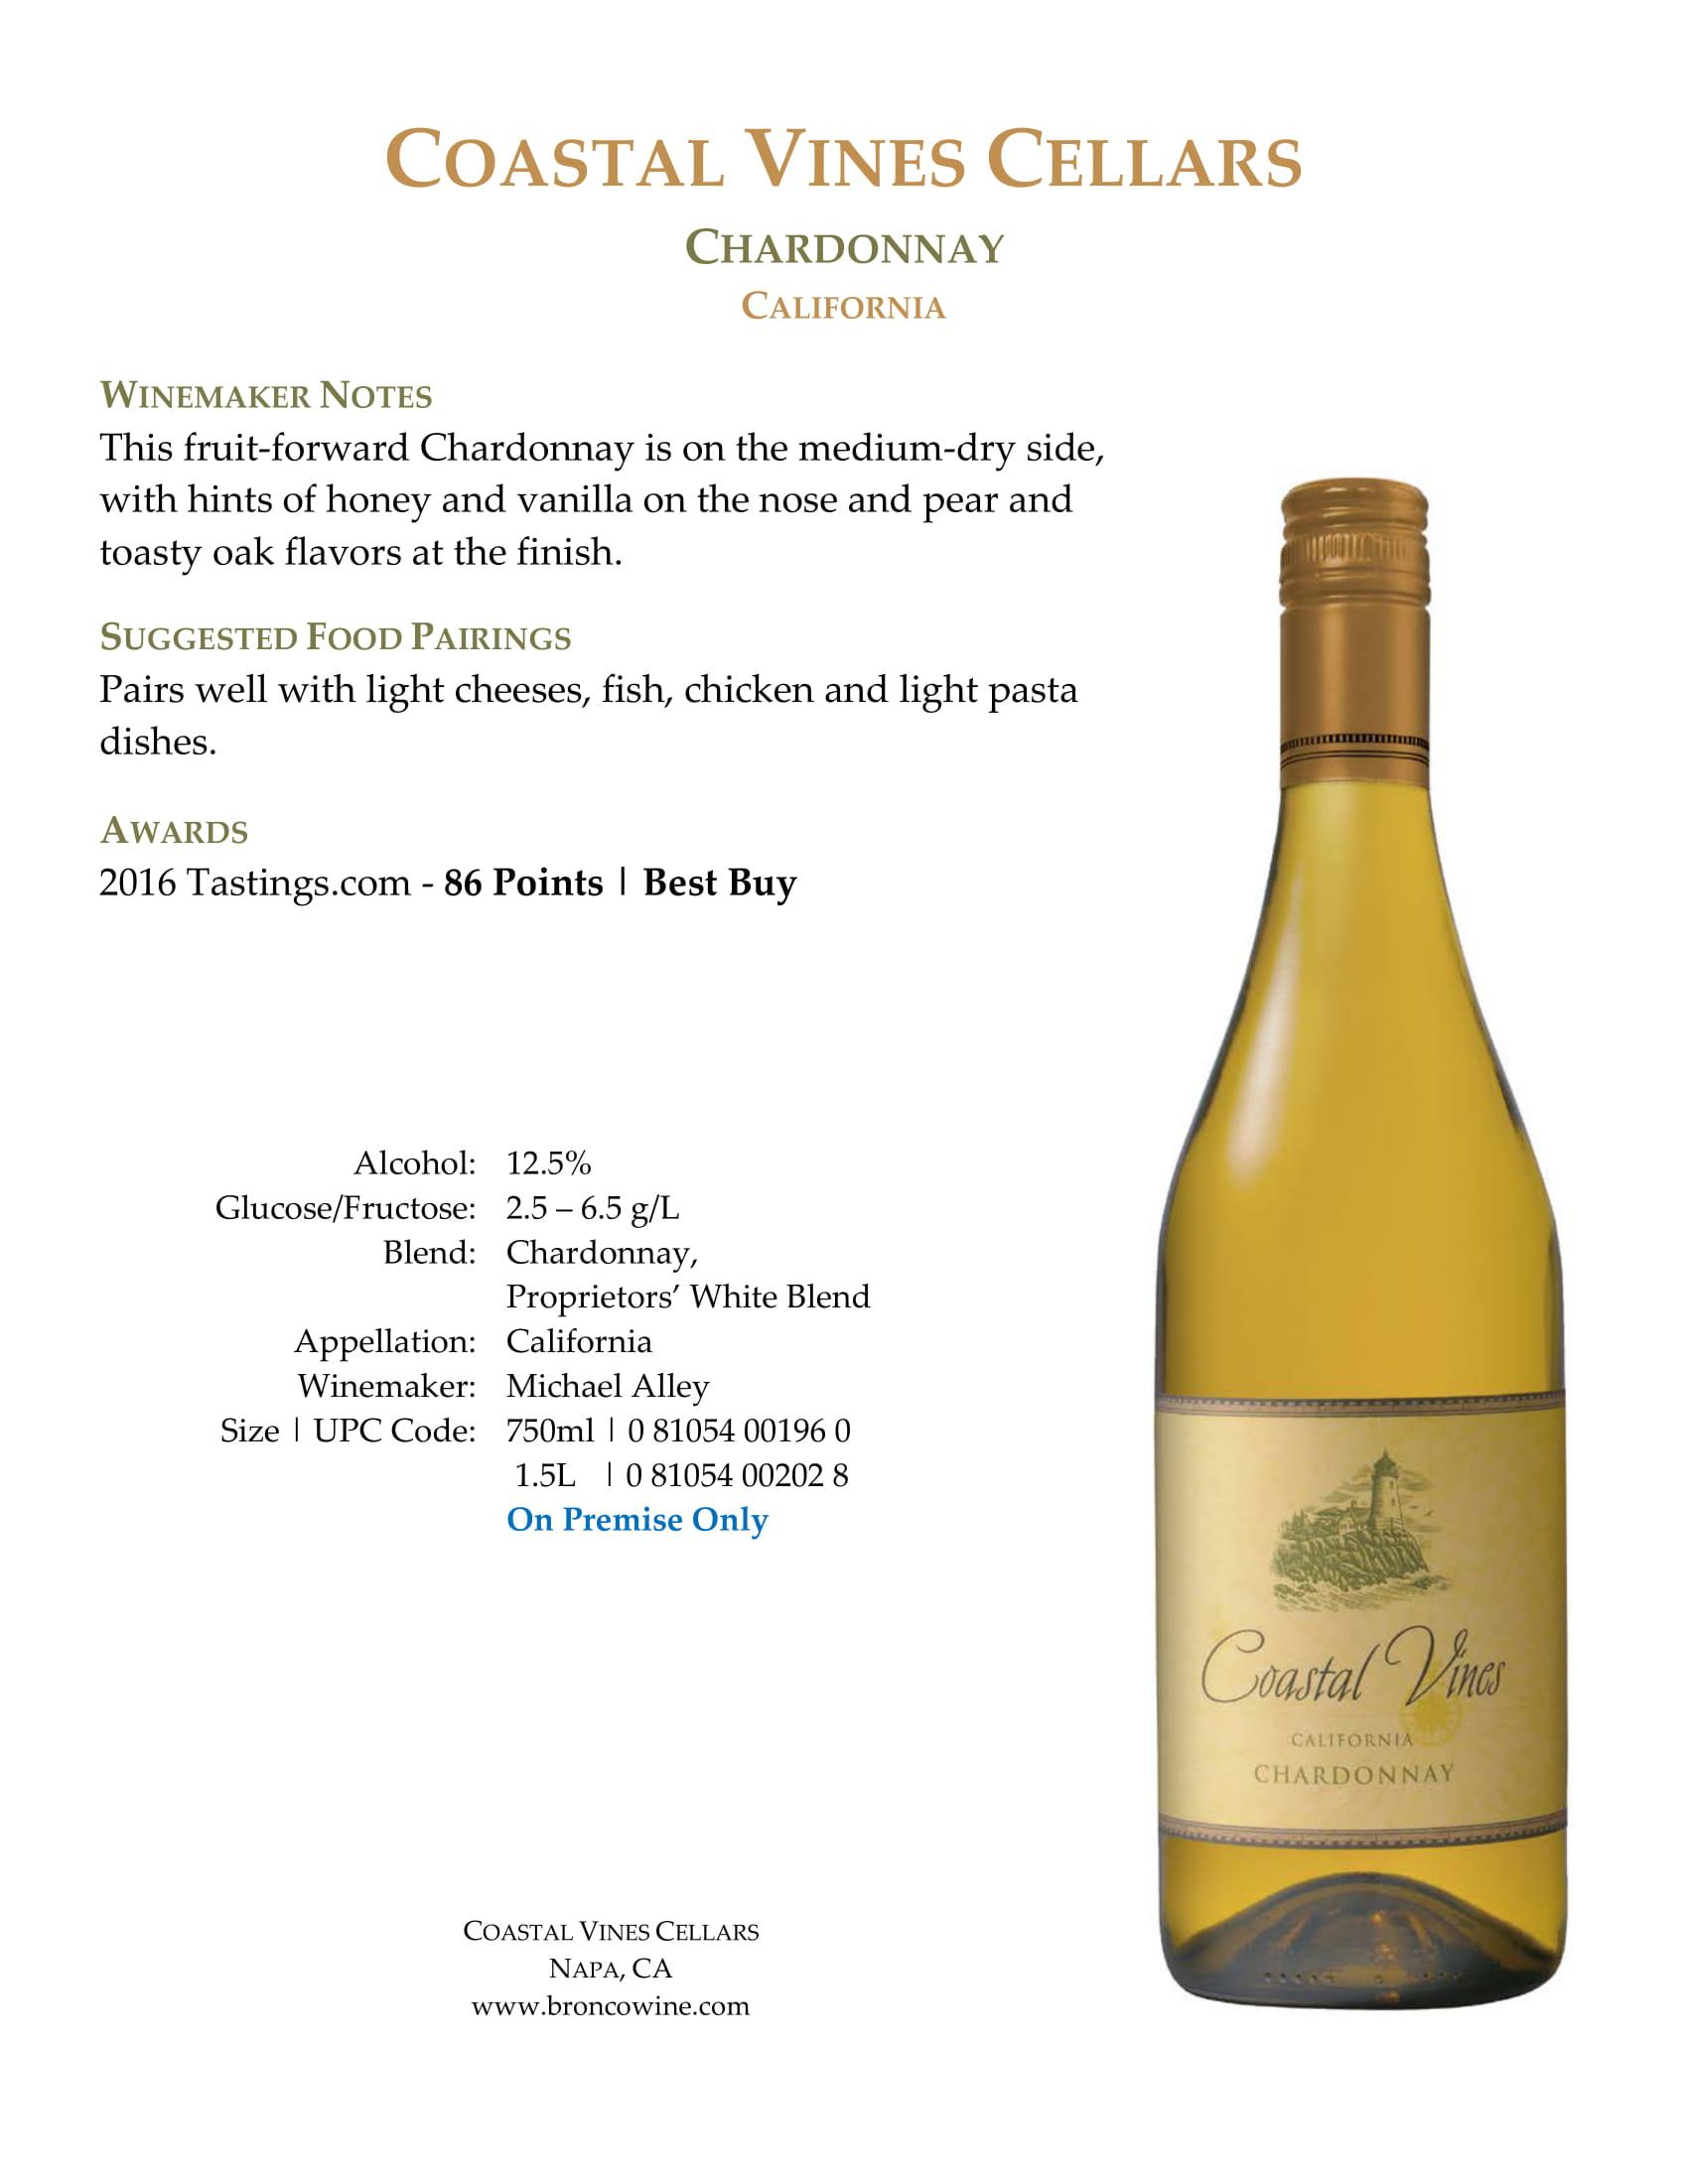 Coastal Vines Chardonnay Sell Sheet